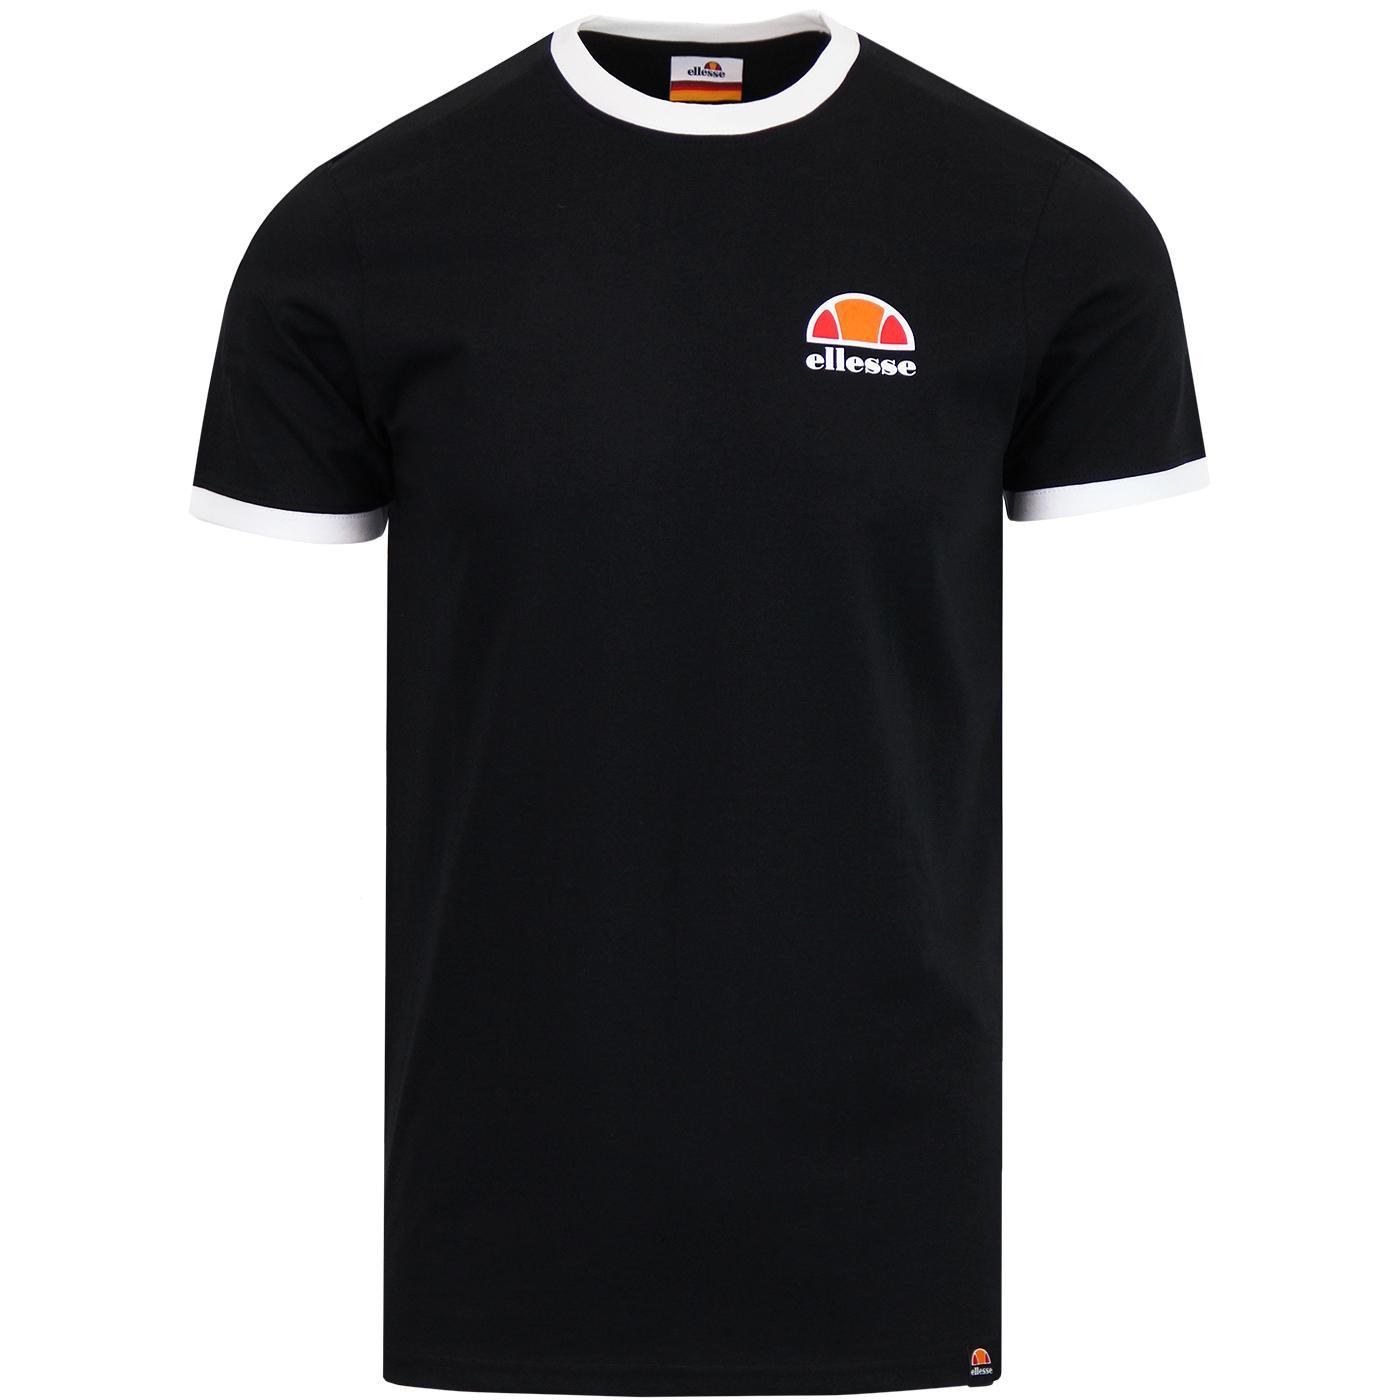 Cubist ELLESSE Retro Classic Logo Ringer T-Shirt B